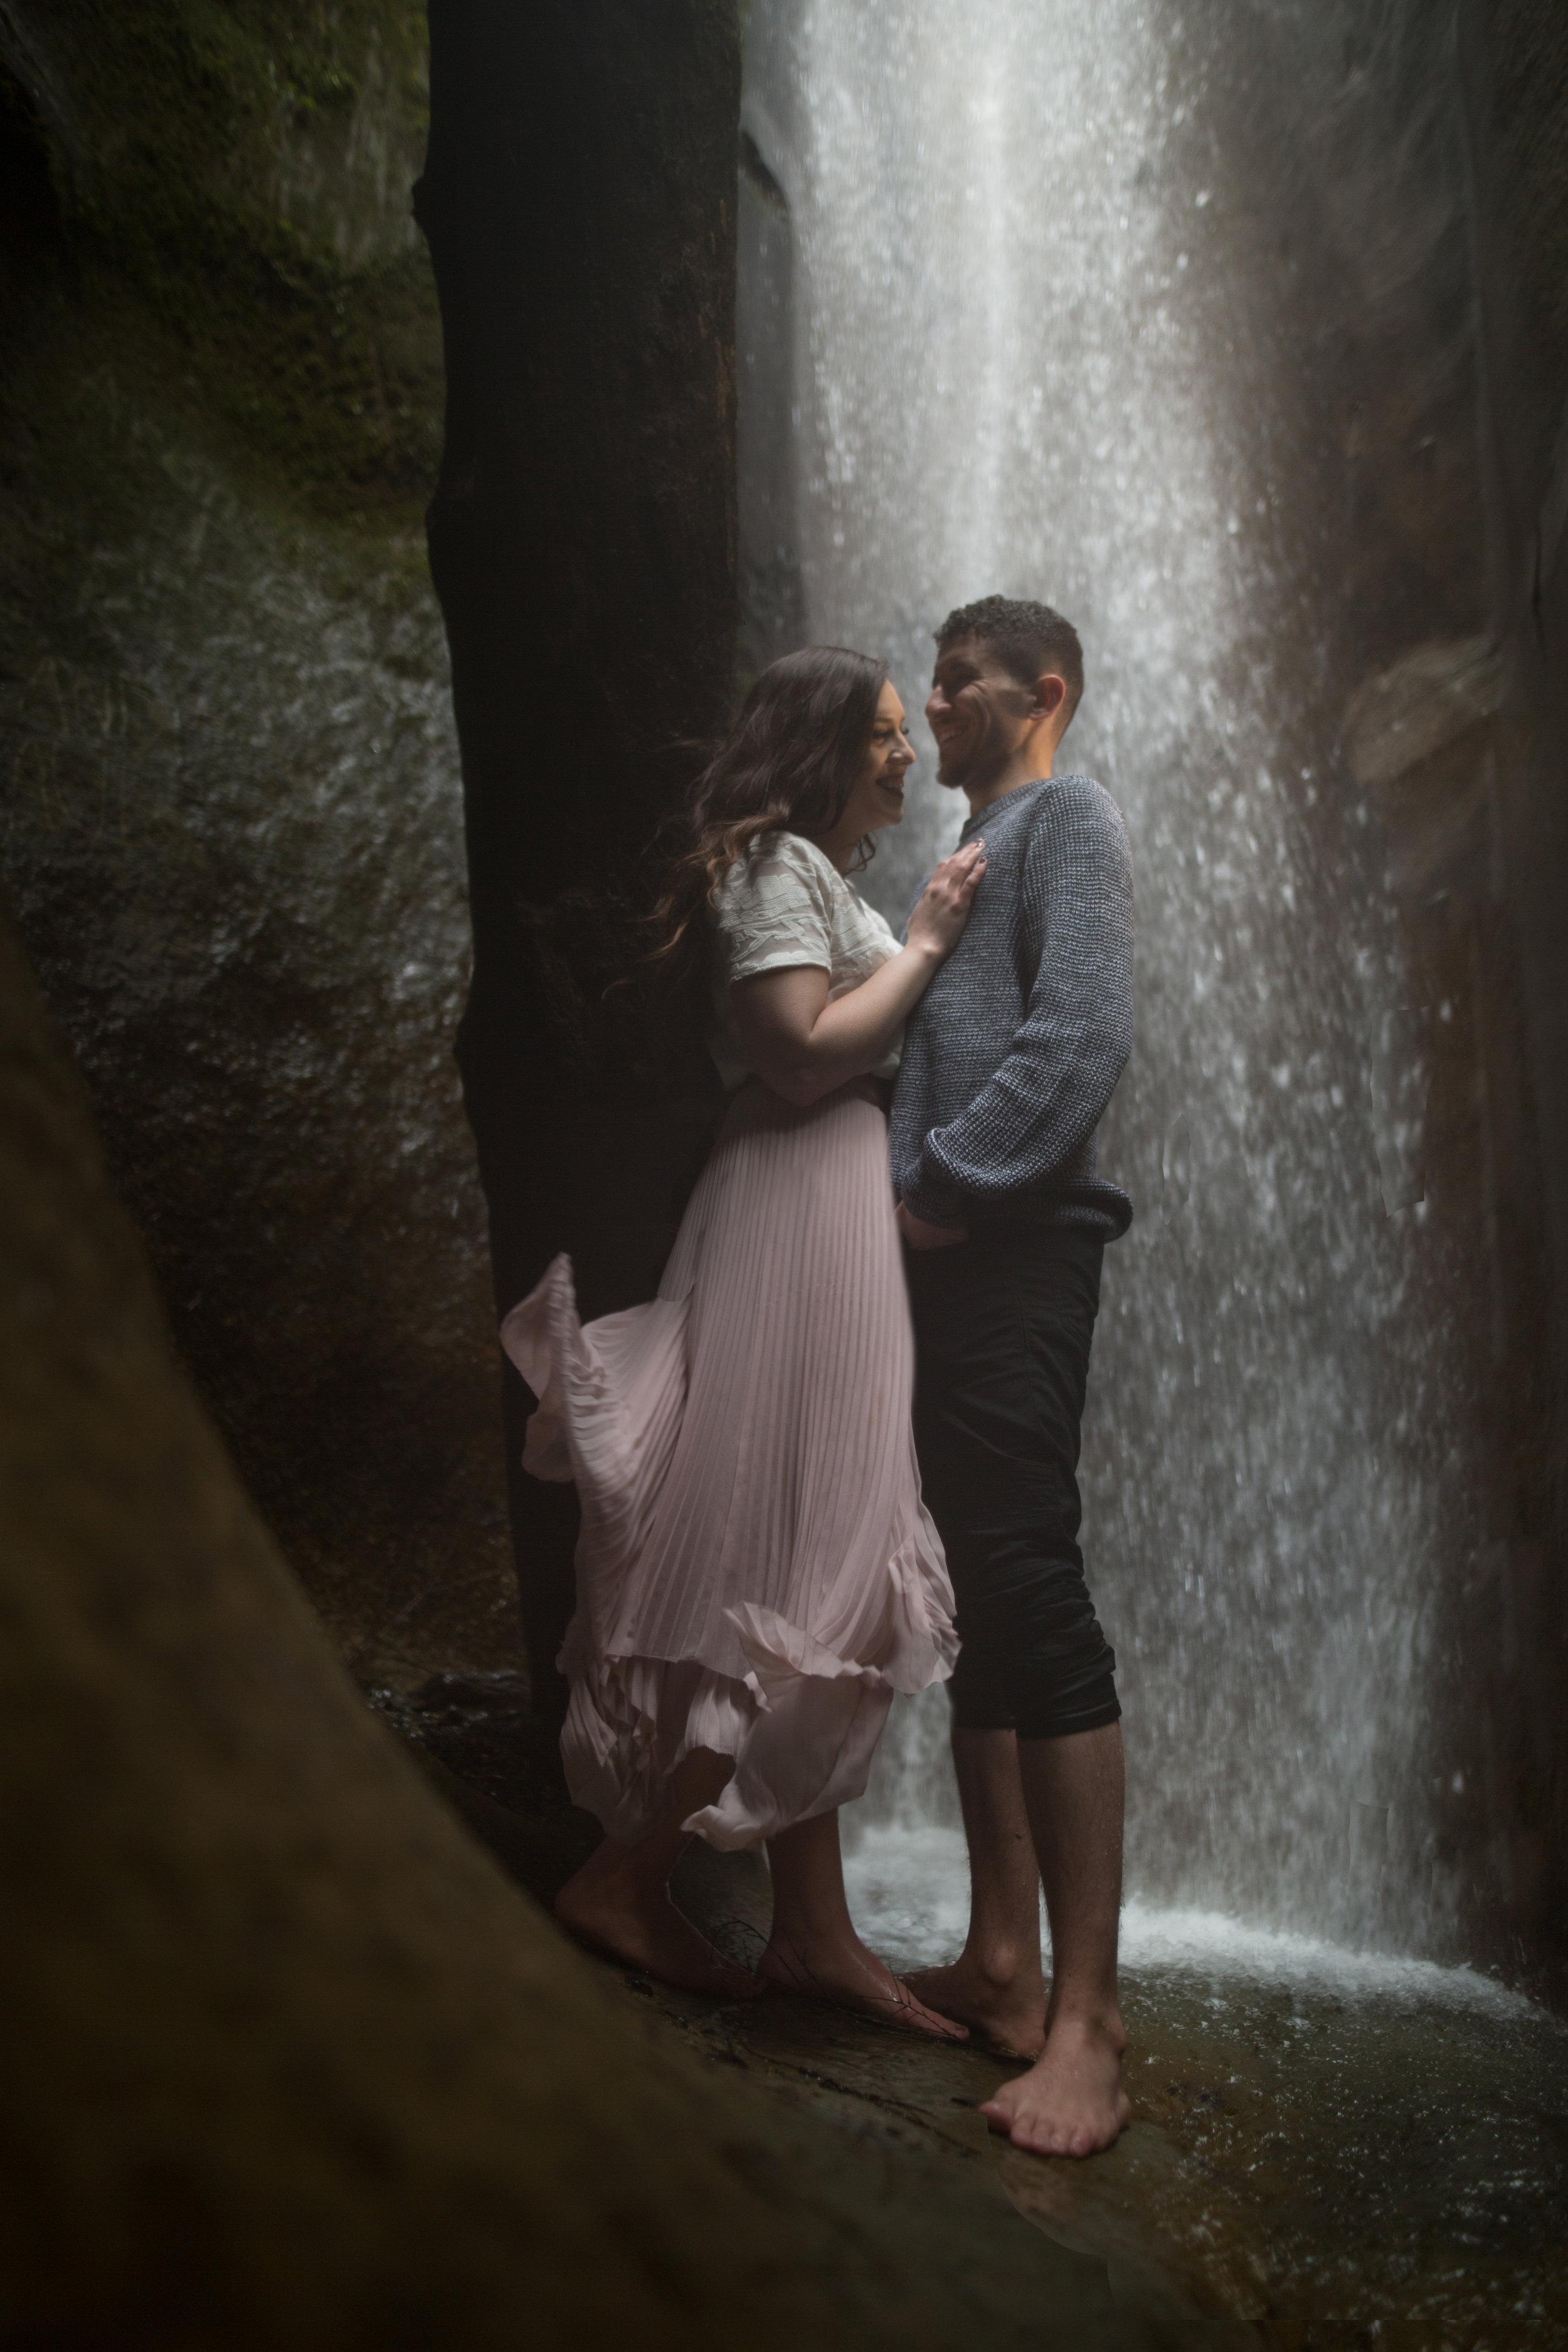 Adam-Ziorio-Photography-epic-engagement.jpg